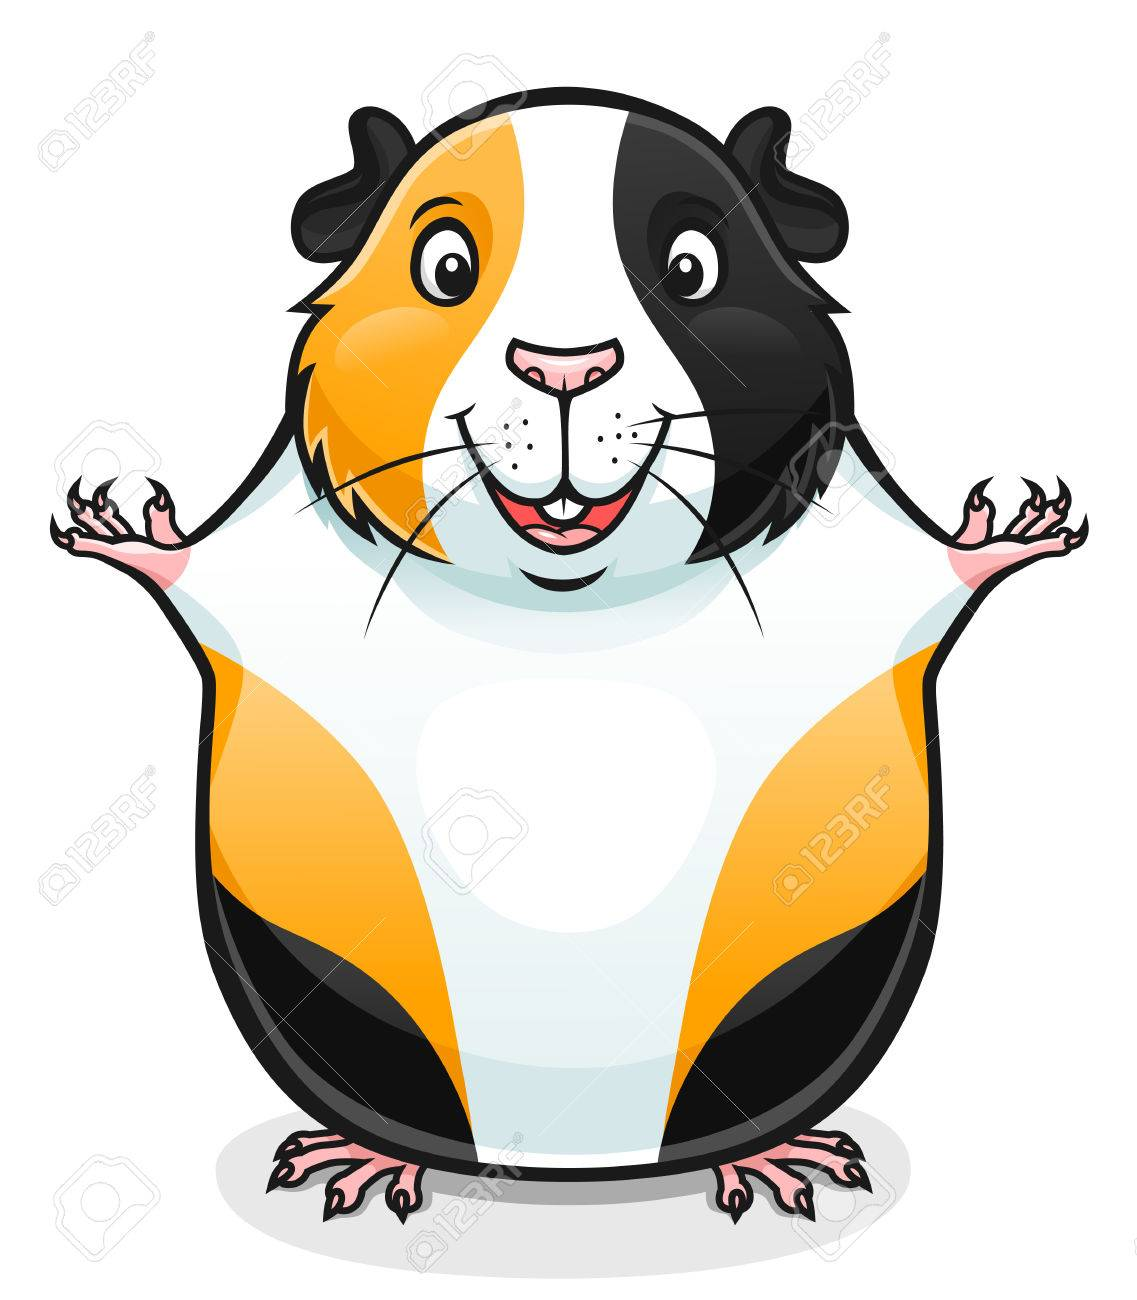 illustration of cute cartoon guinea pig royalty free cliparts rh 123rf com free clipart guinea pig guinea pig clip art images